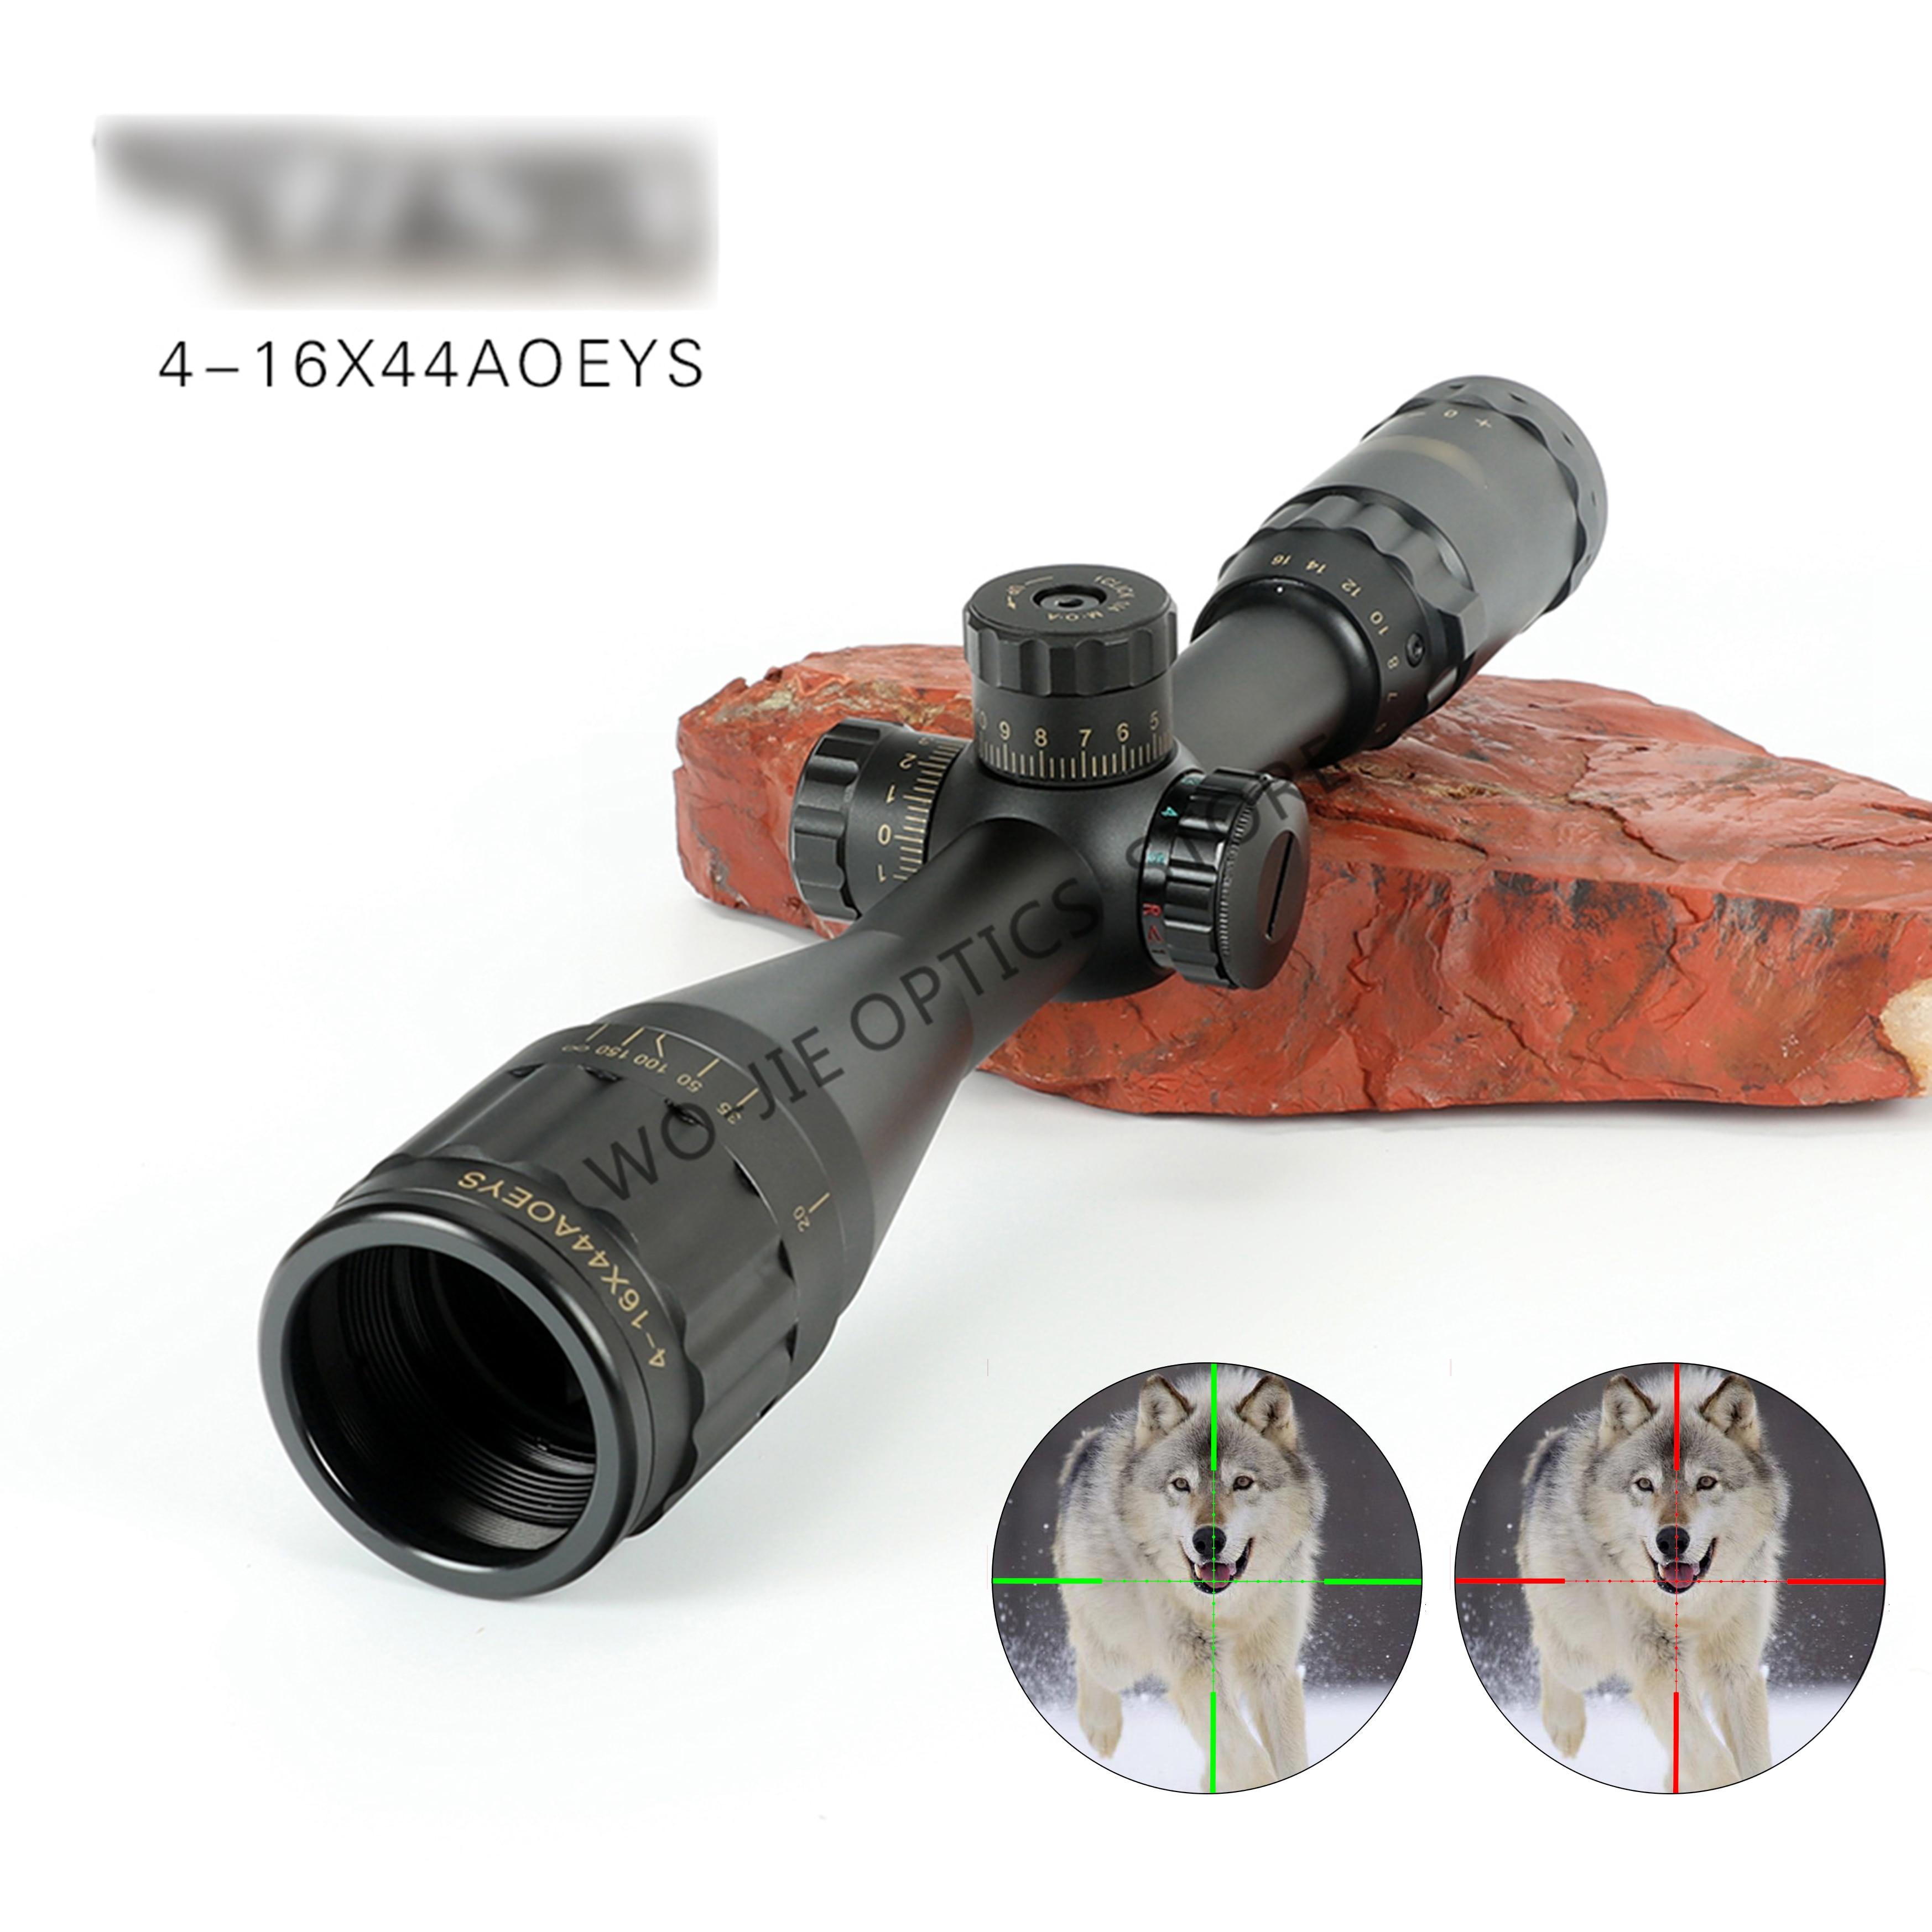 BSA OPTICS 4-16x44 ST Tactical Optic Sight Green Red Illuminated Riflescope Hunting Rifle Scope Sniper Airsoft Air Guns